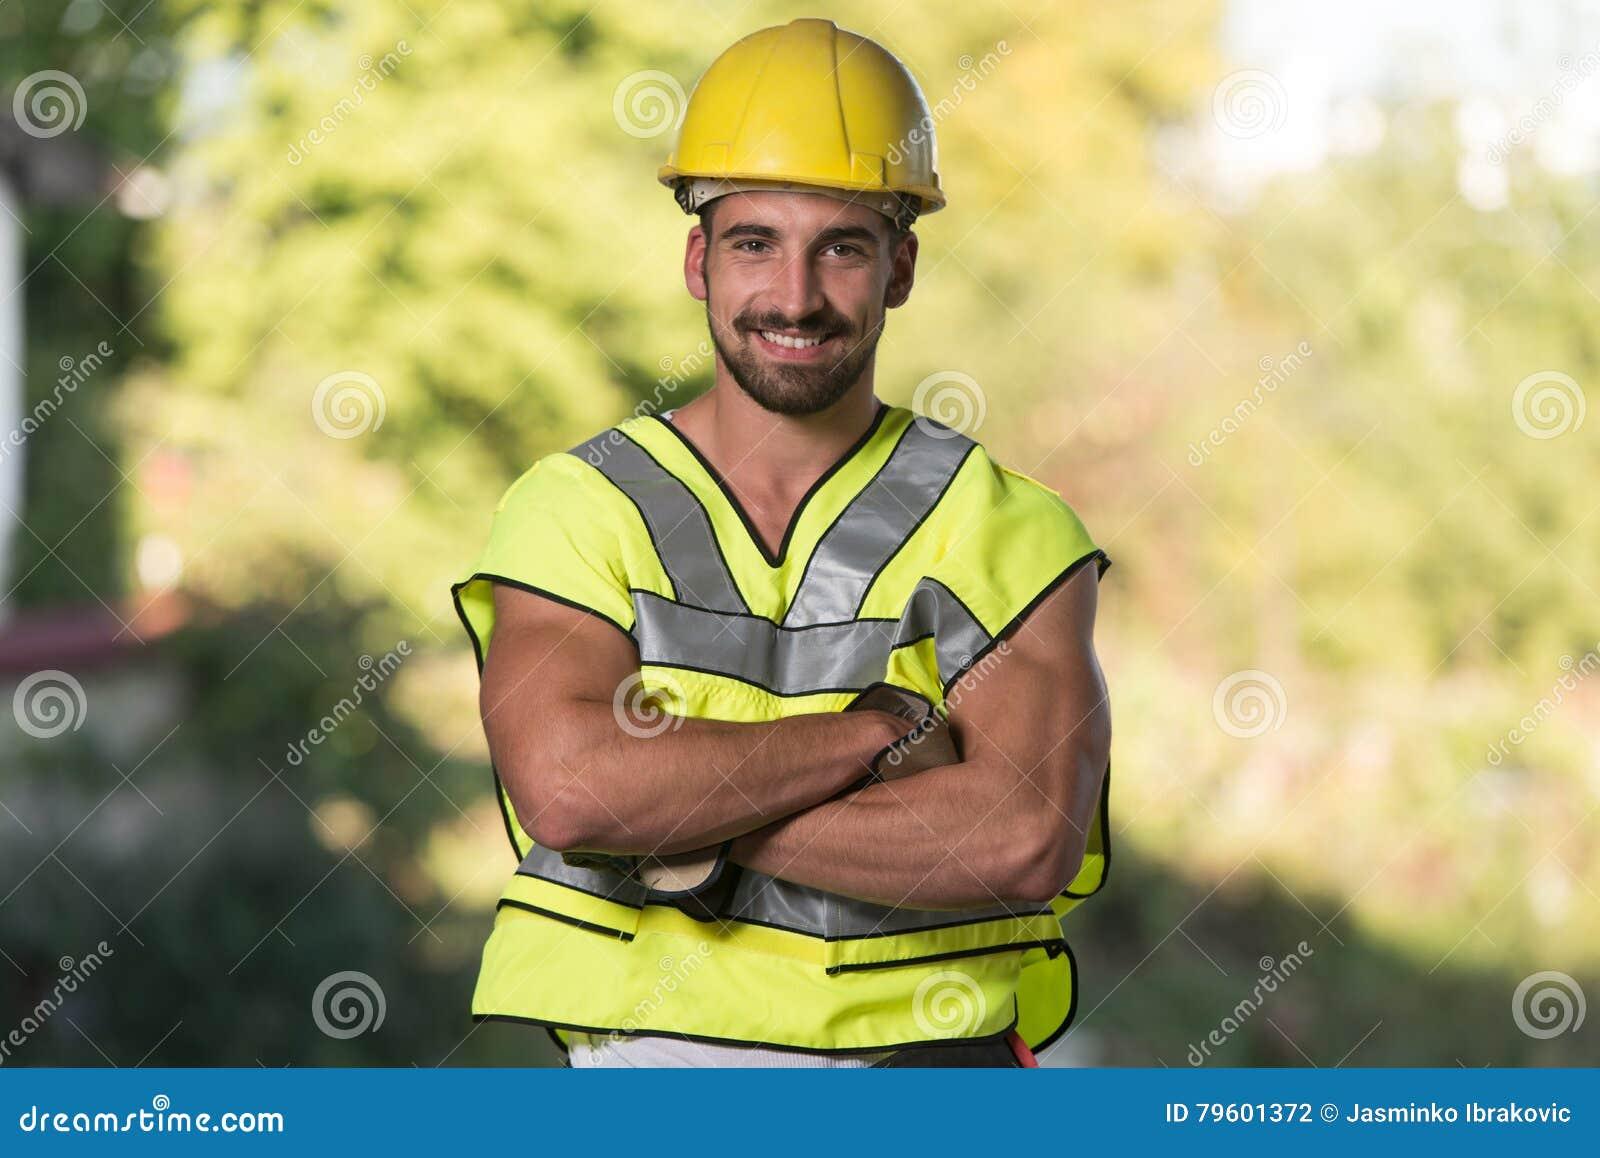 Coordenador Construction Wearing um capacete amarelo